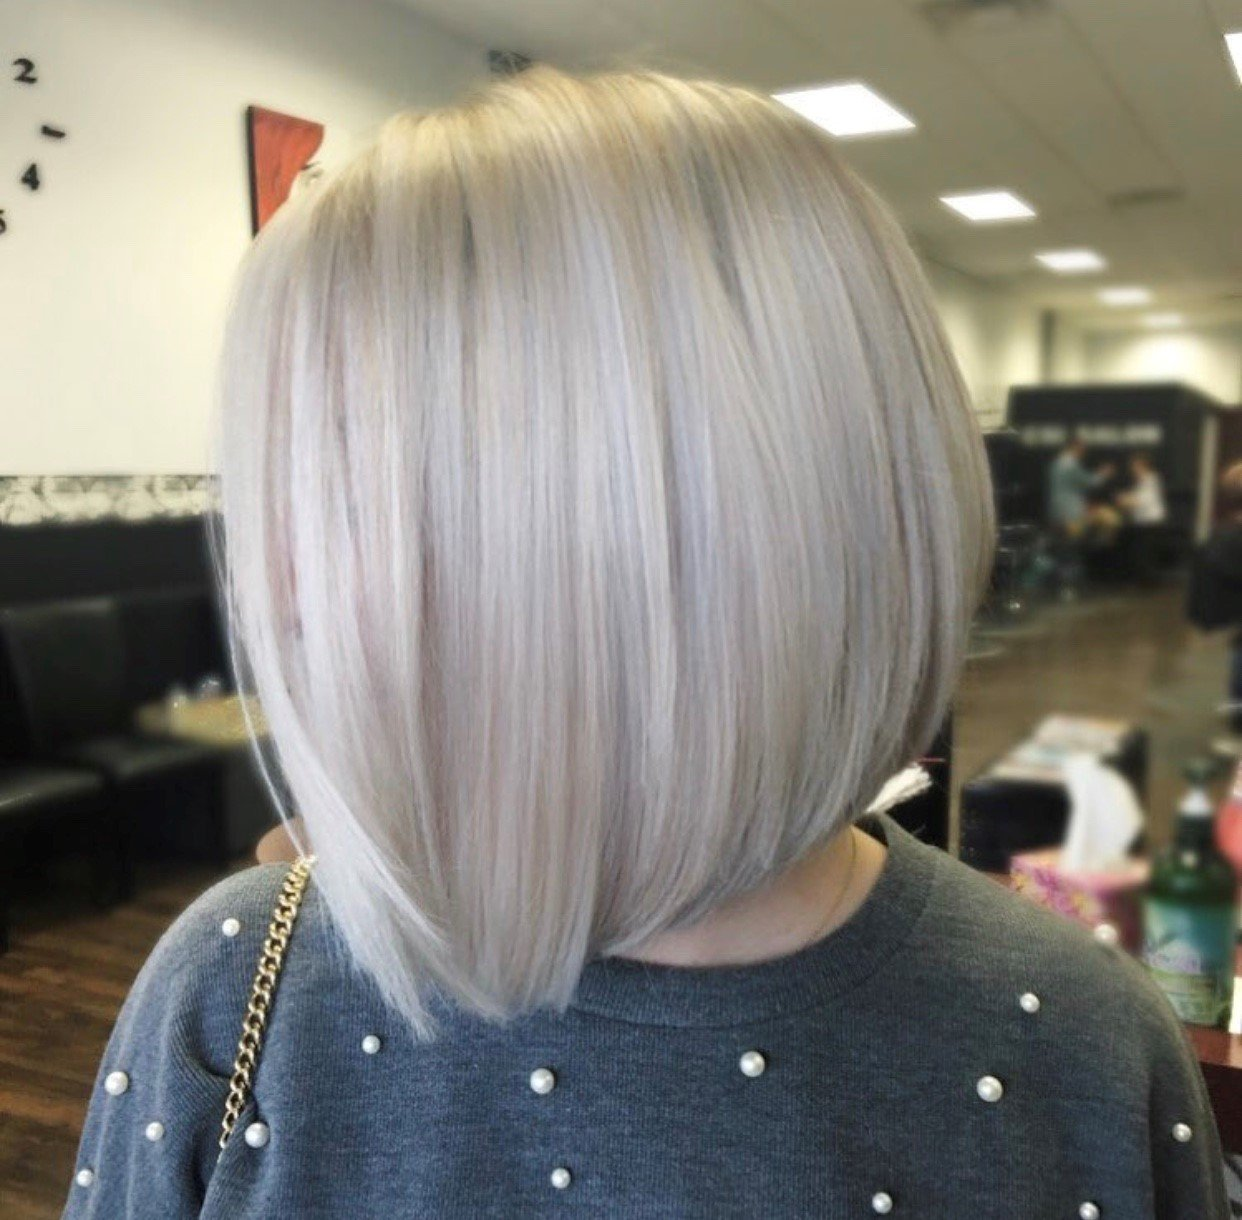 Csi Hair Salon Hair Care Farmingville Ny